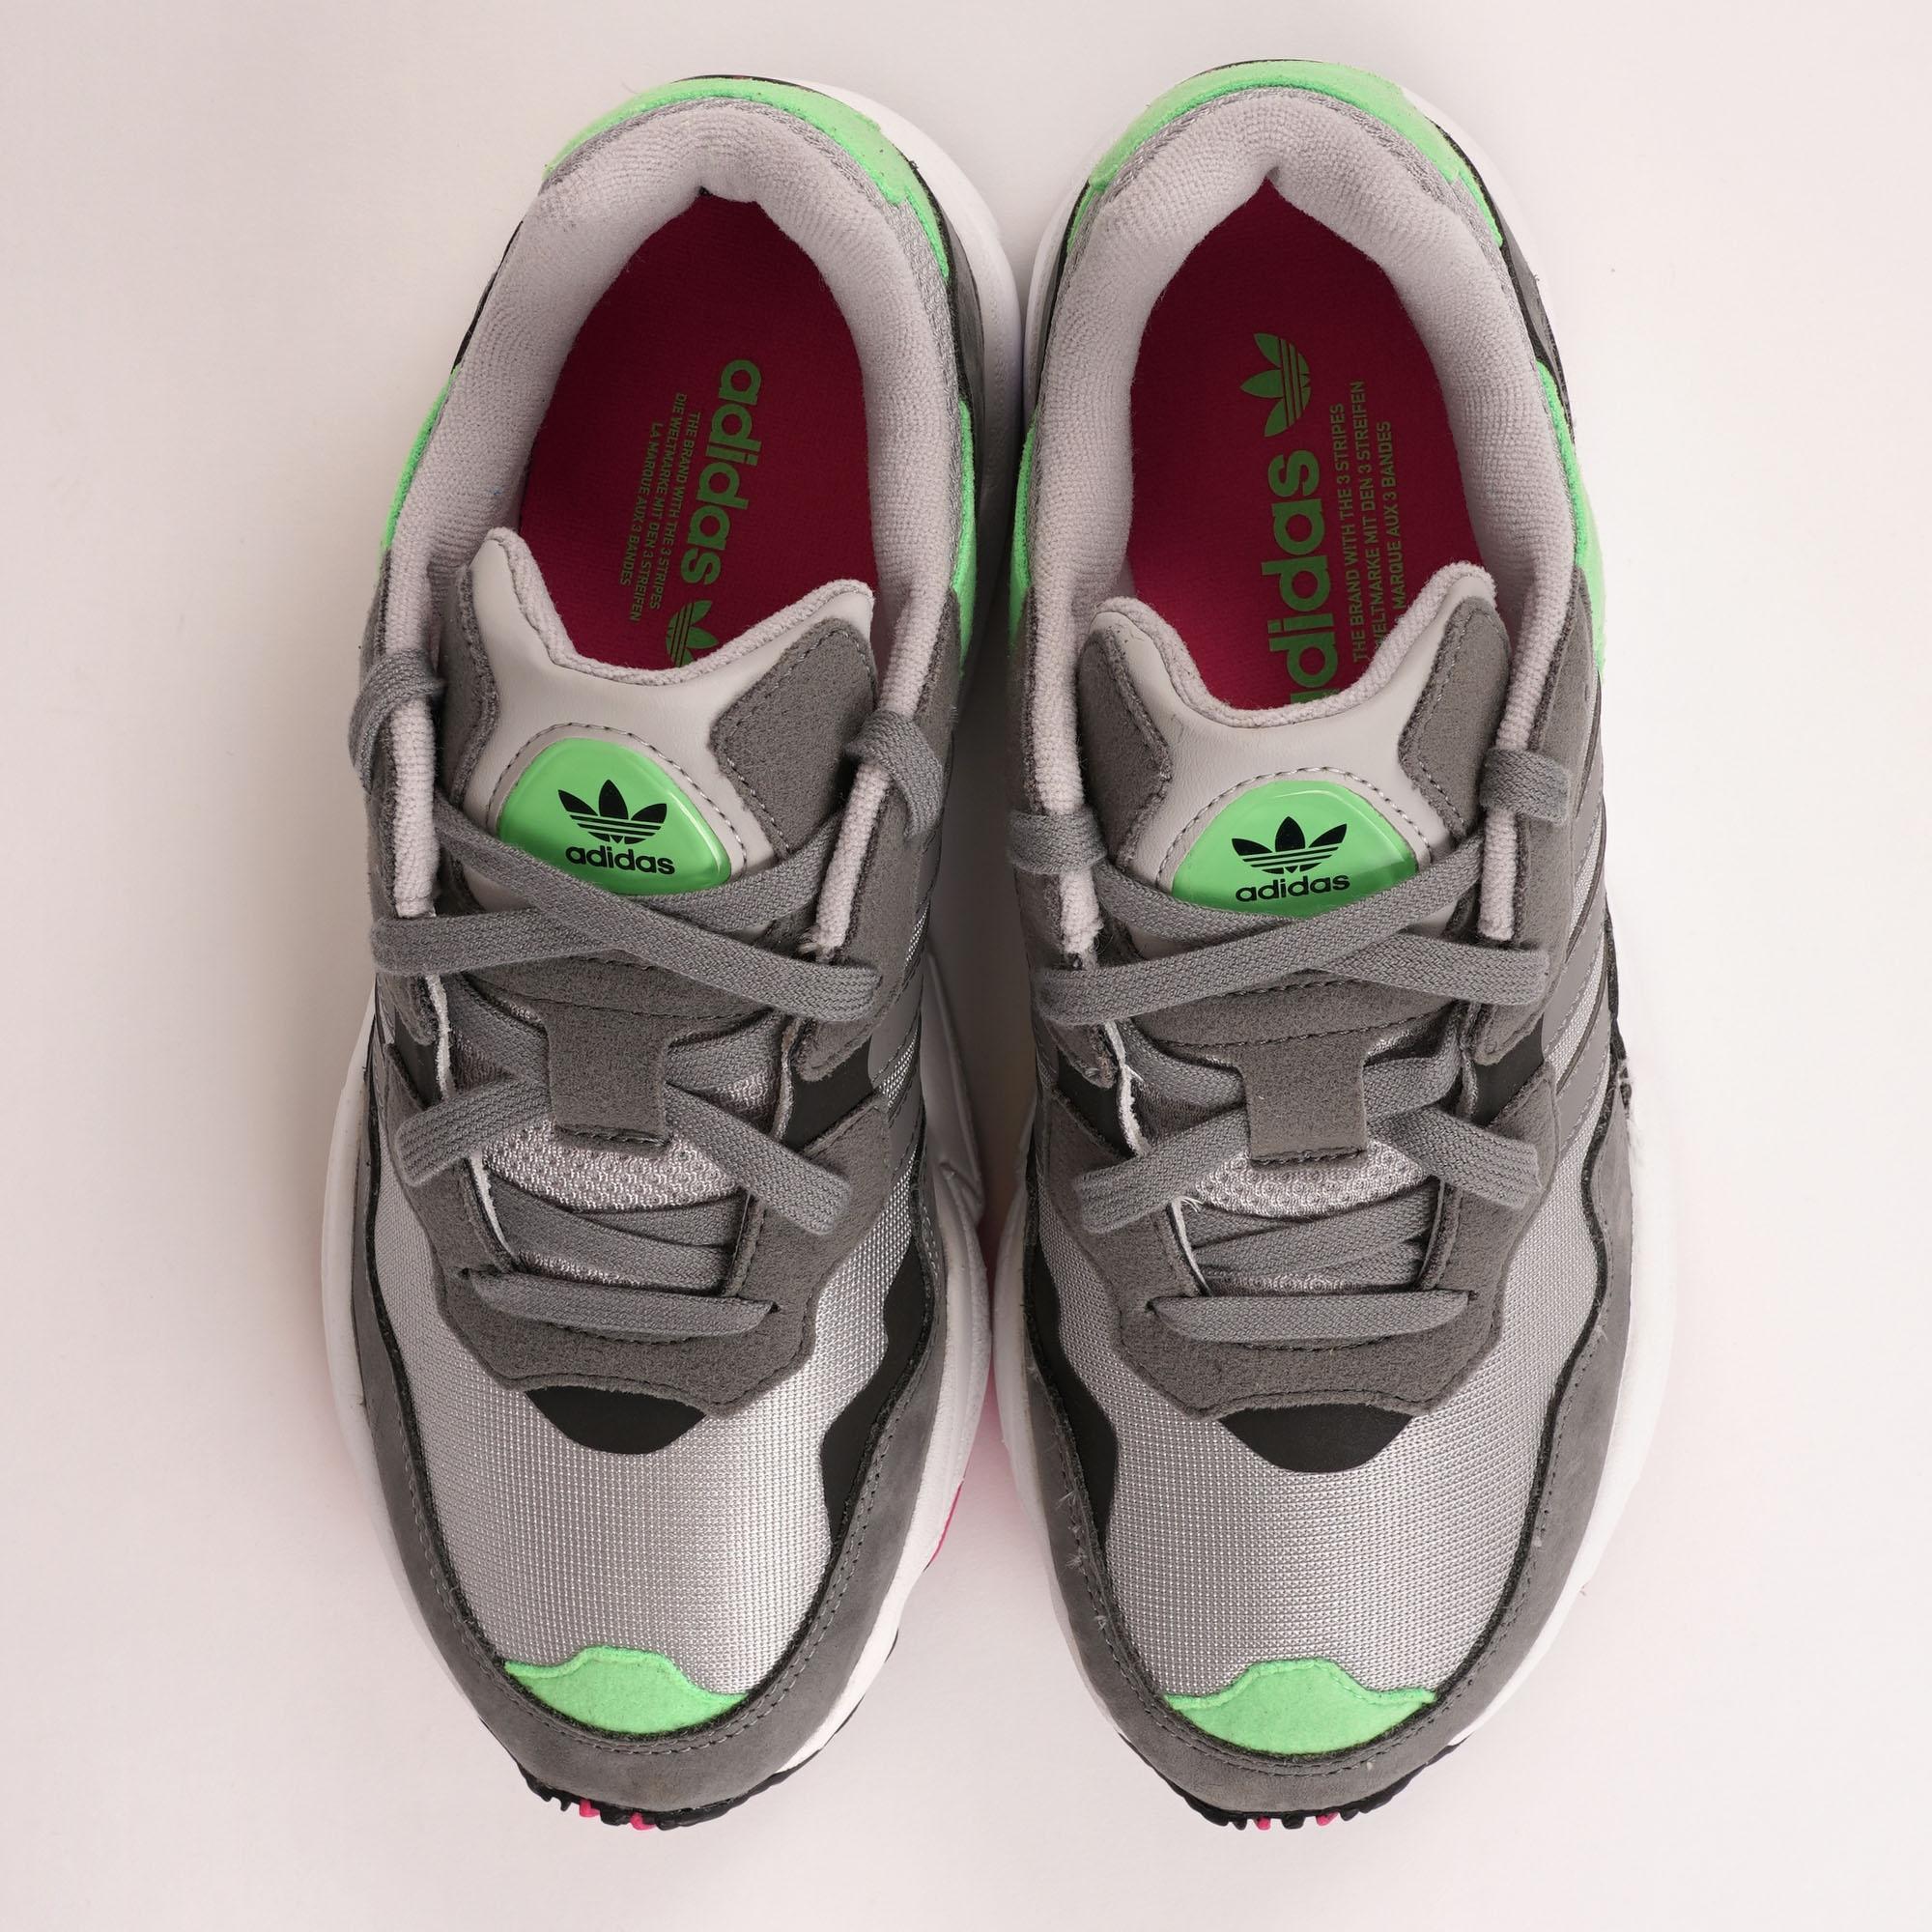 detailed look 91b8f 84d8c adidas Originals Yung-96 for Men - Lyst